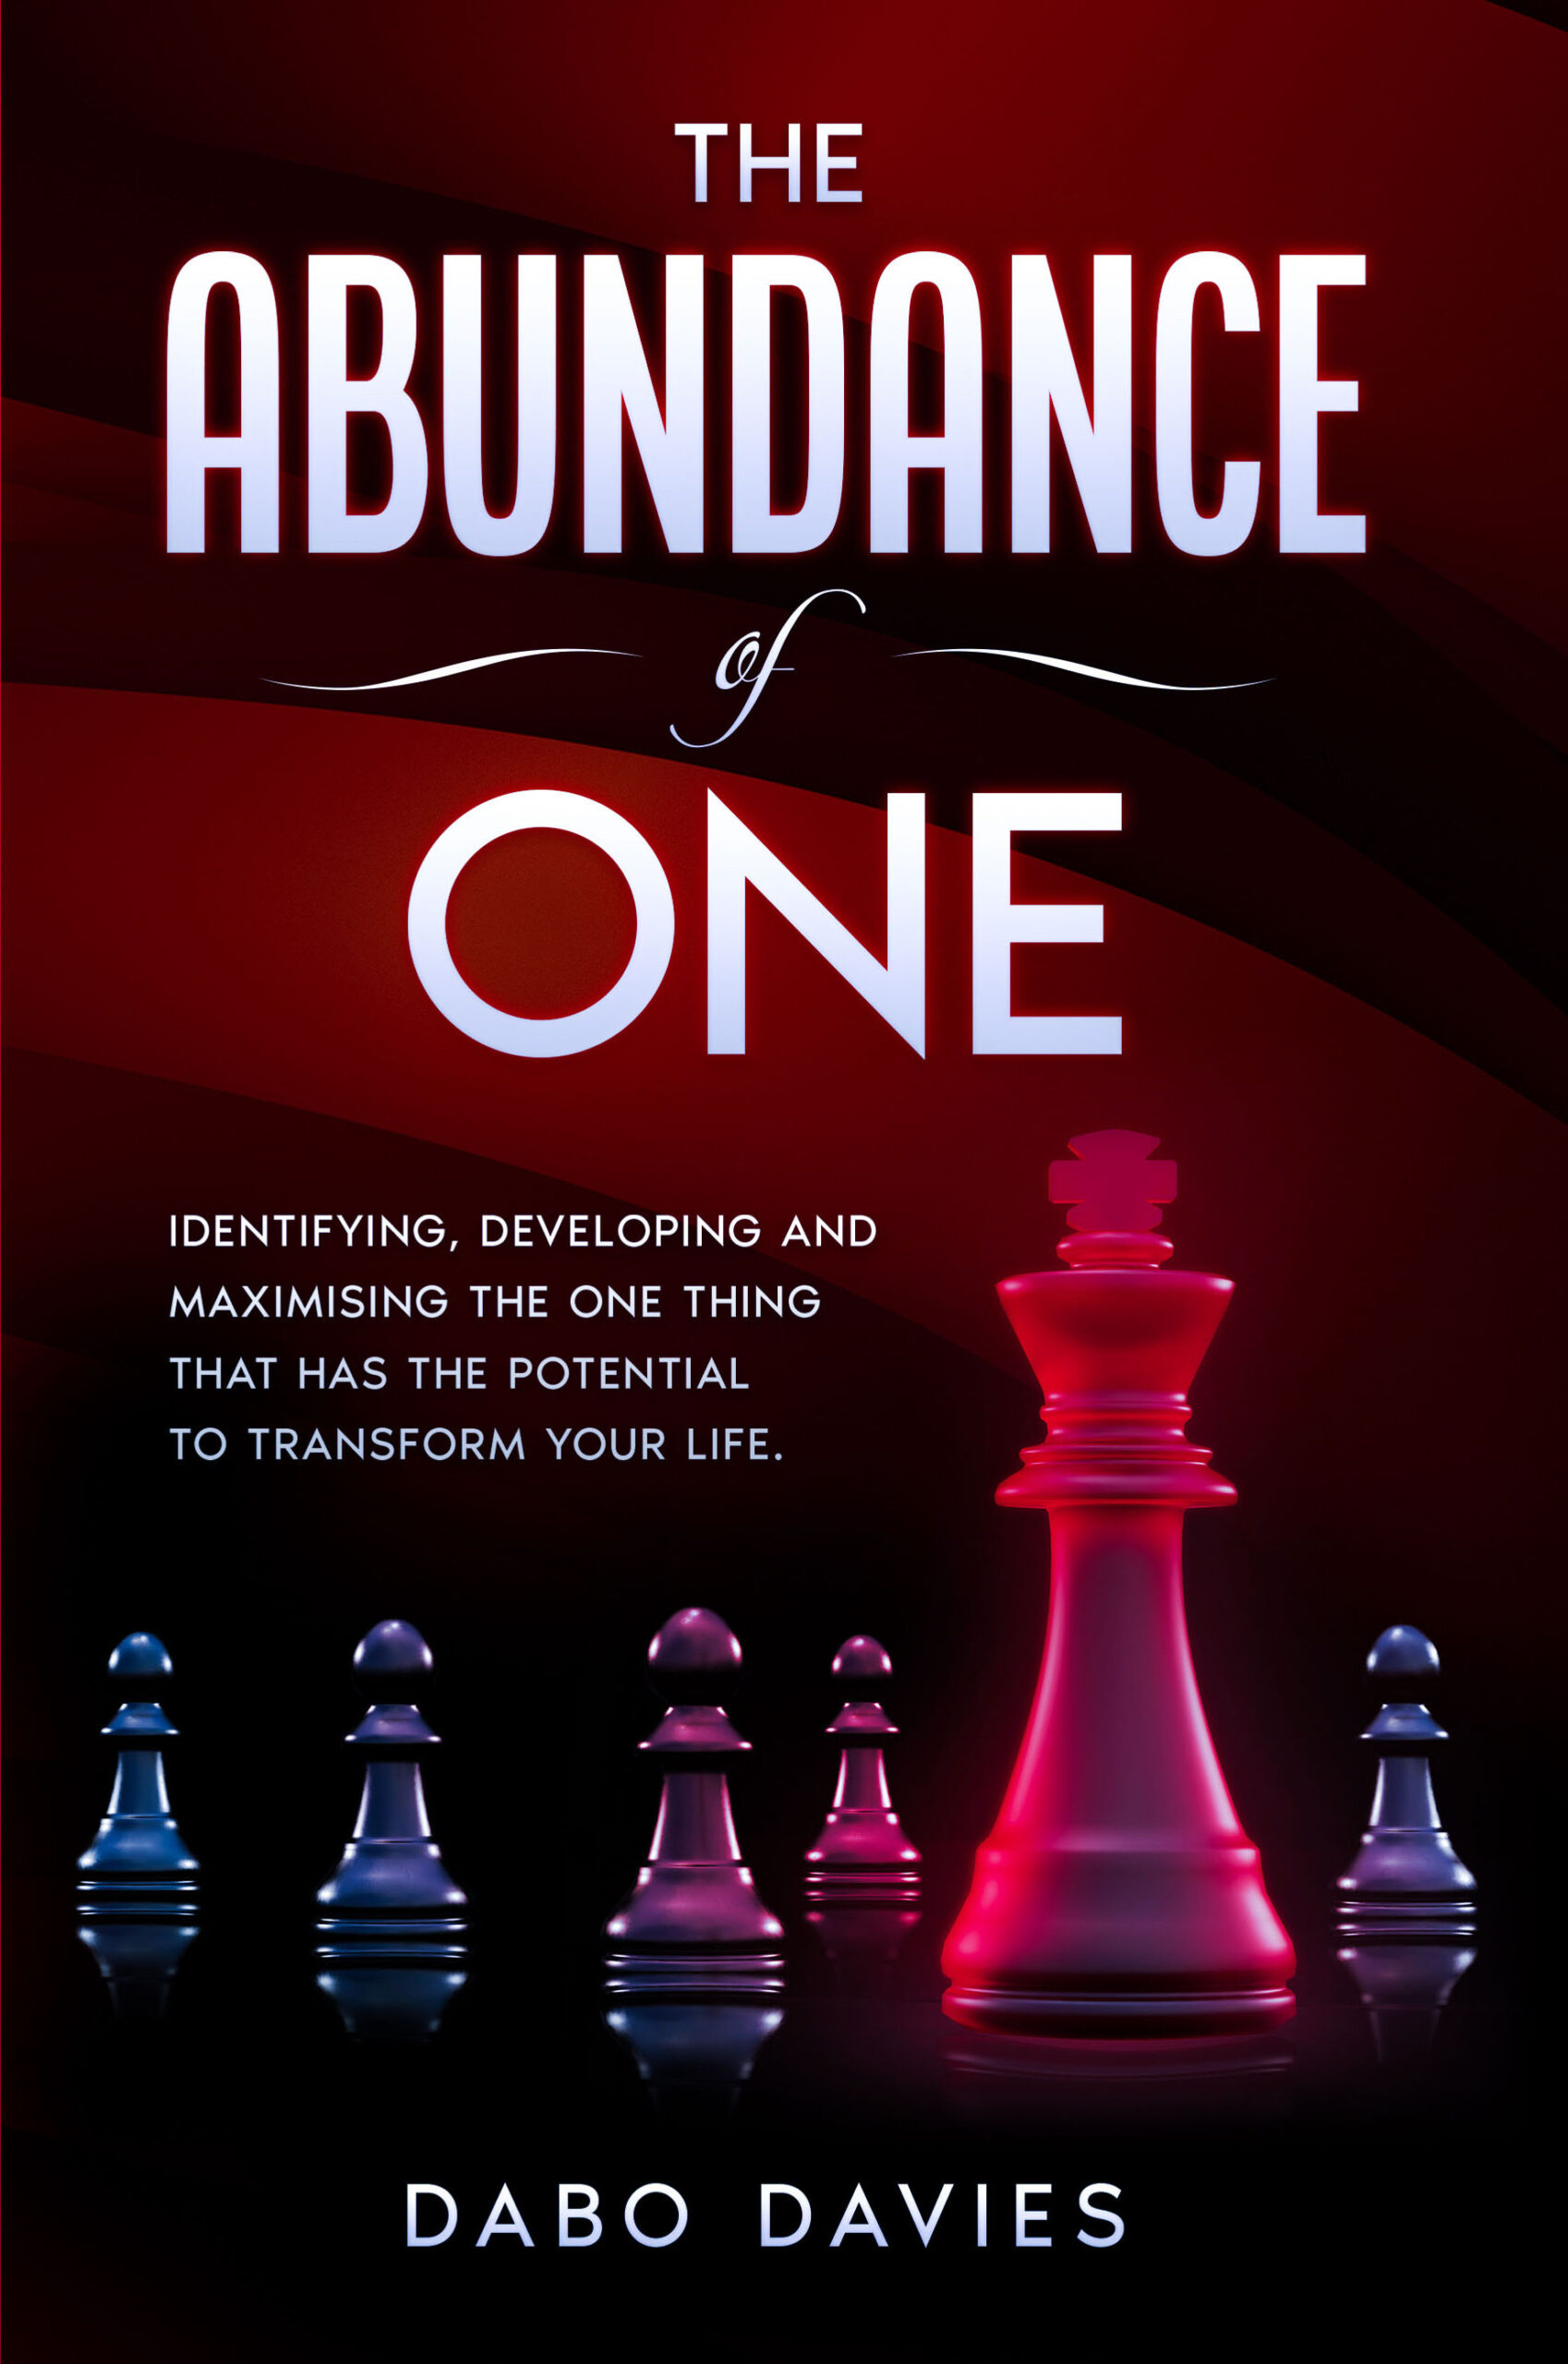 THE ABUNDANCE OF ONE